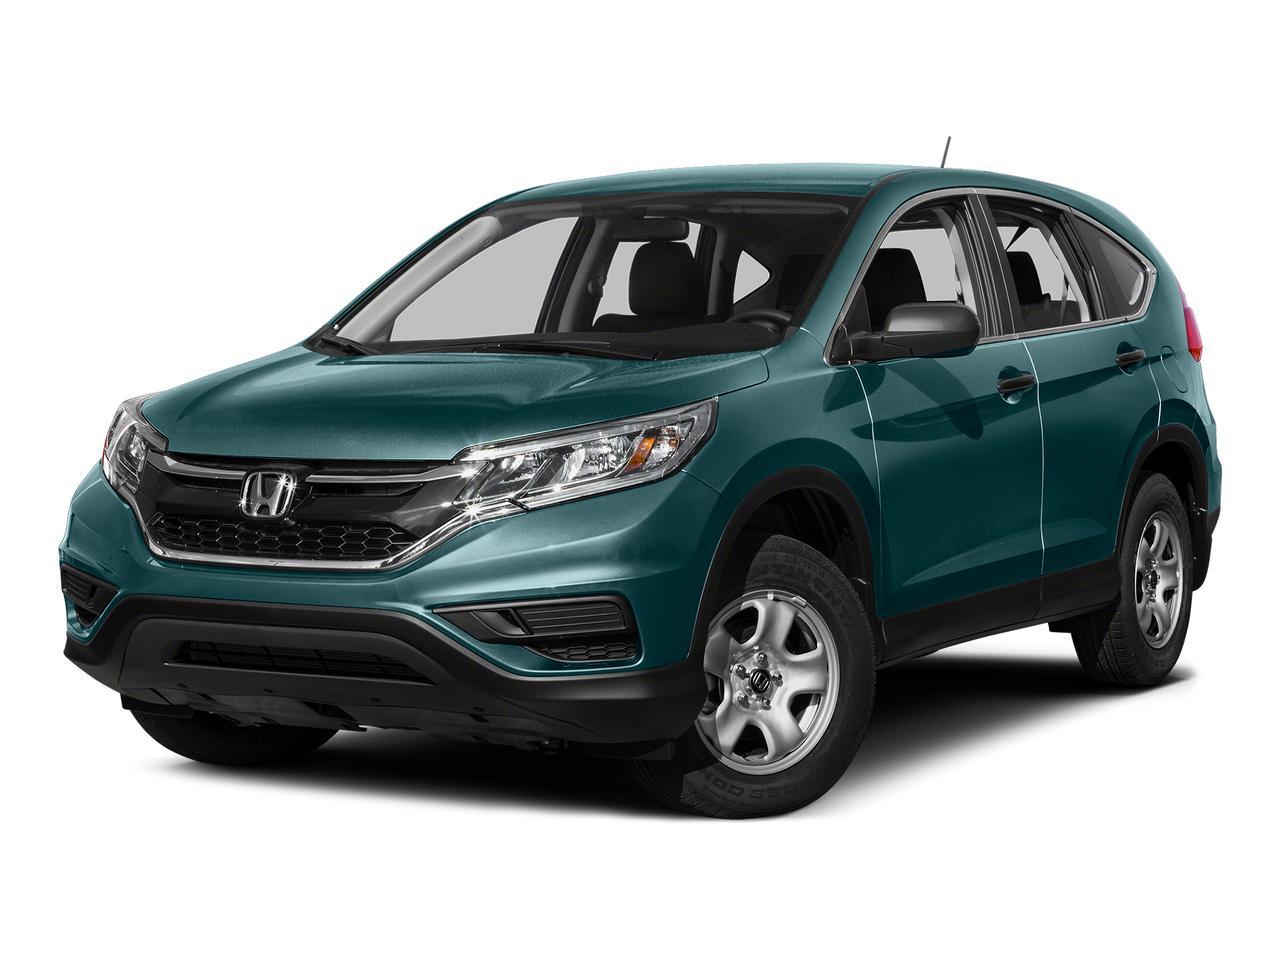 2015 Honda CR-V Vehicle Photo in San Antonio, TX 78238